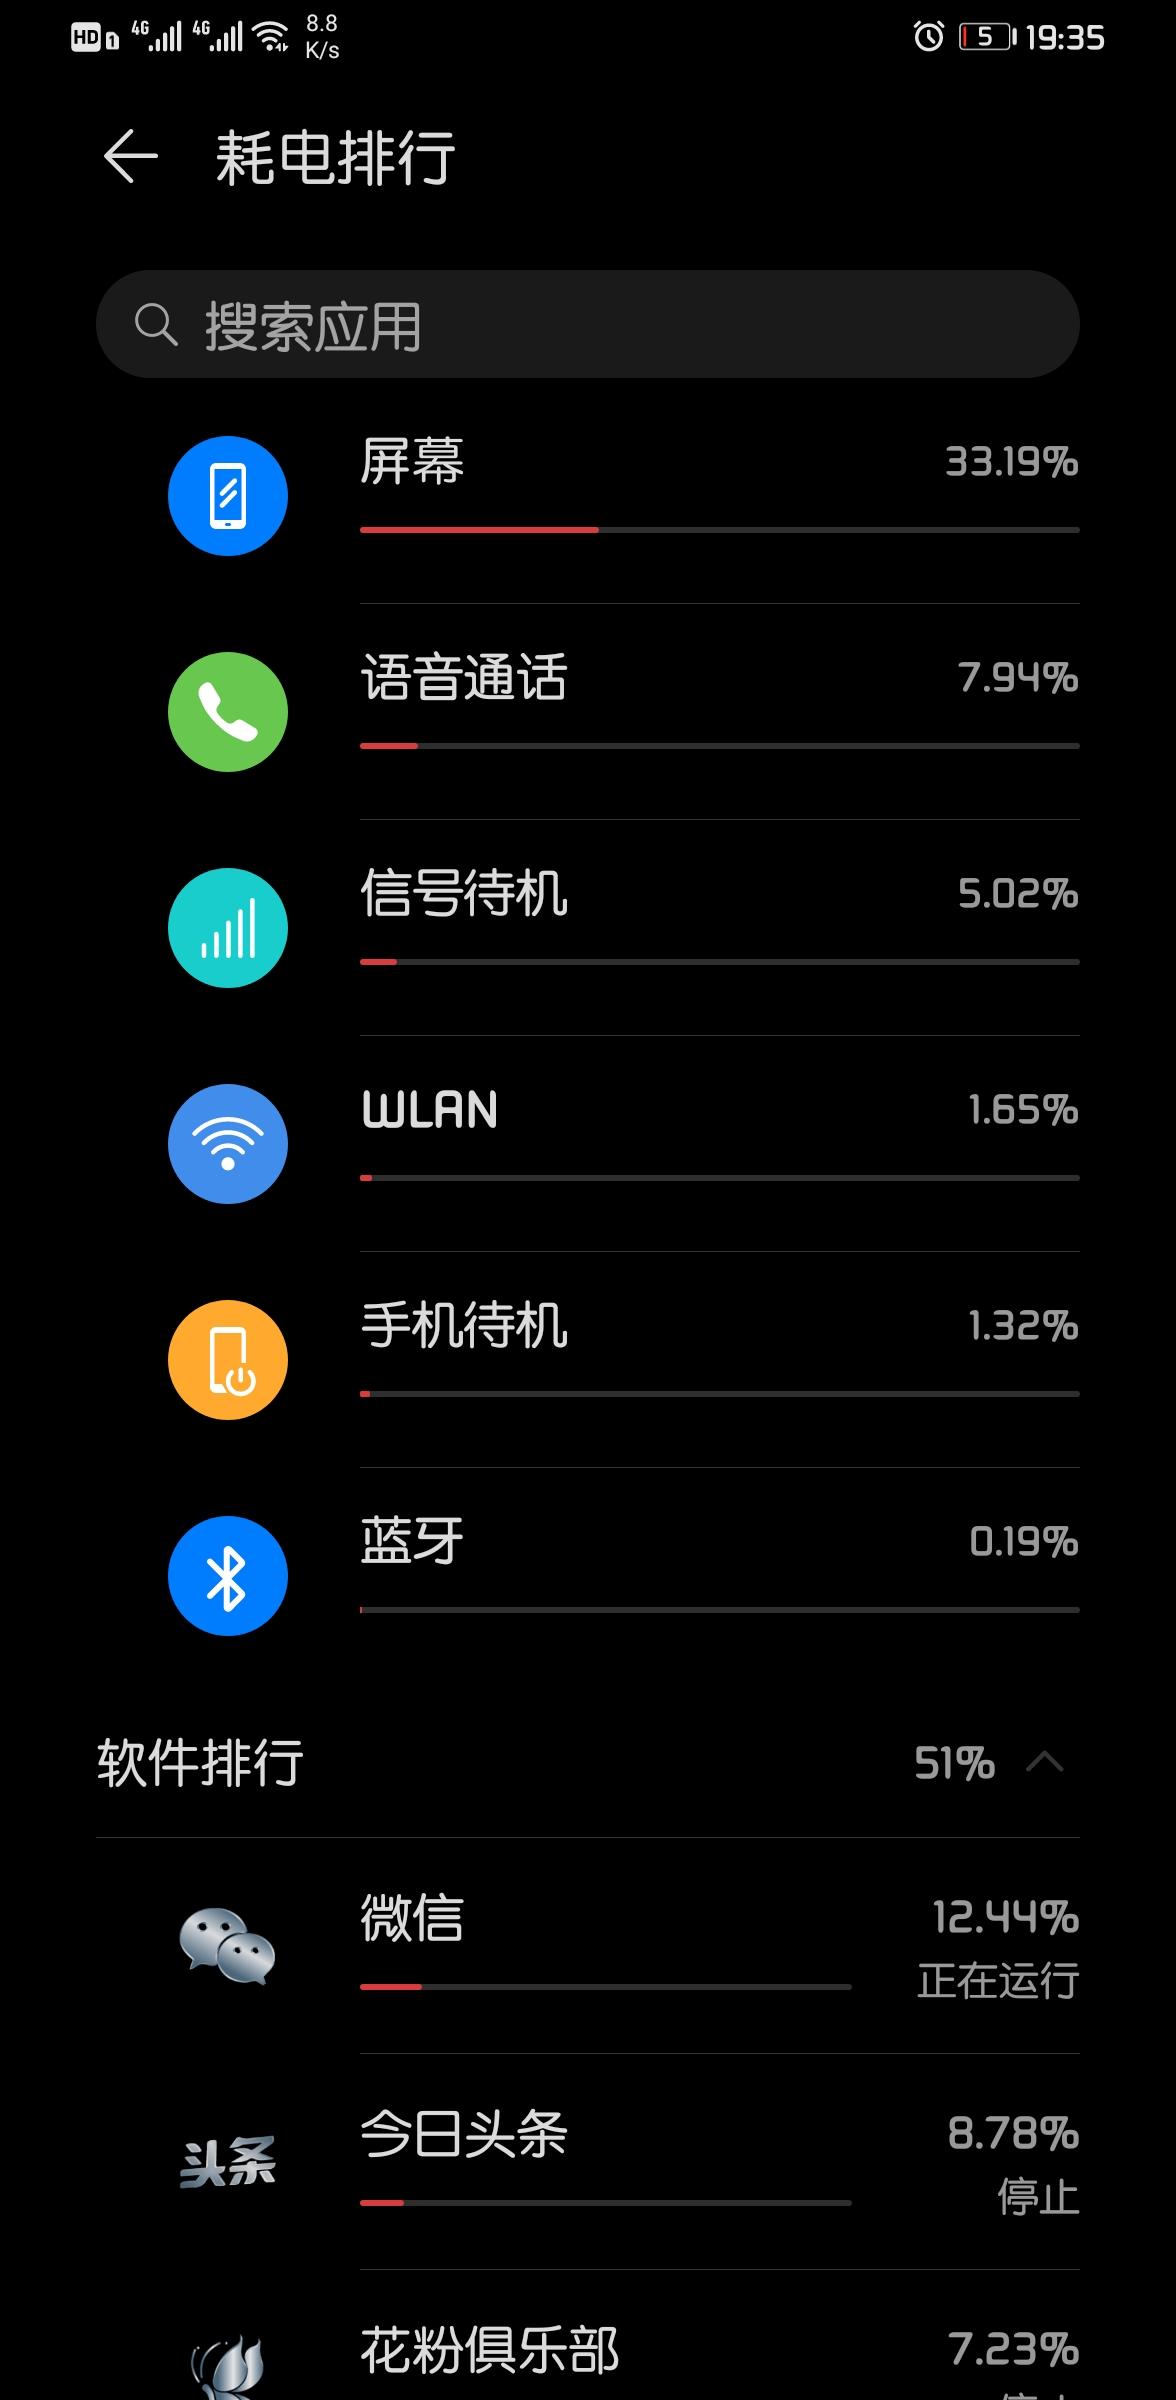 Screenshot_20200512_193532_com.huawei.systemmanager.jpg